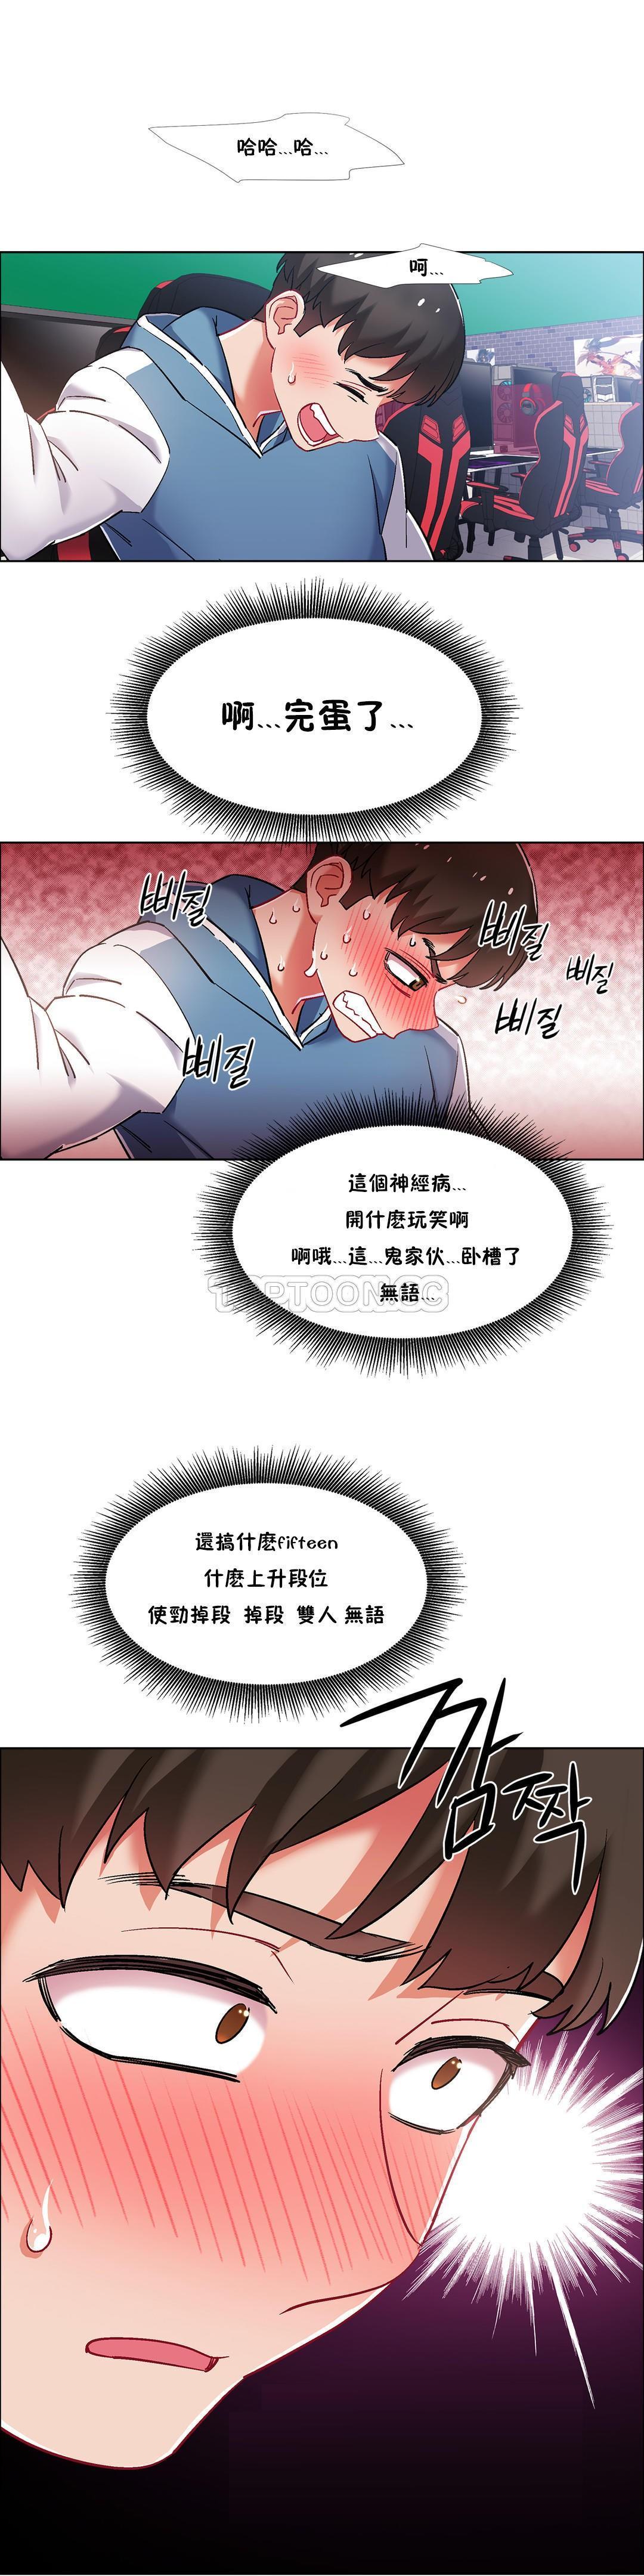 [Studio Wannabe] Rental Girls | 出租女郎 Ch. 33-58 [Chinese]  第二季 完结 91